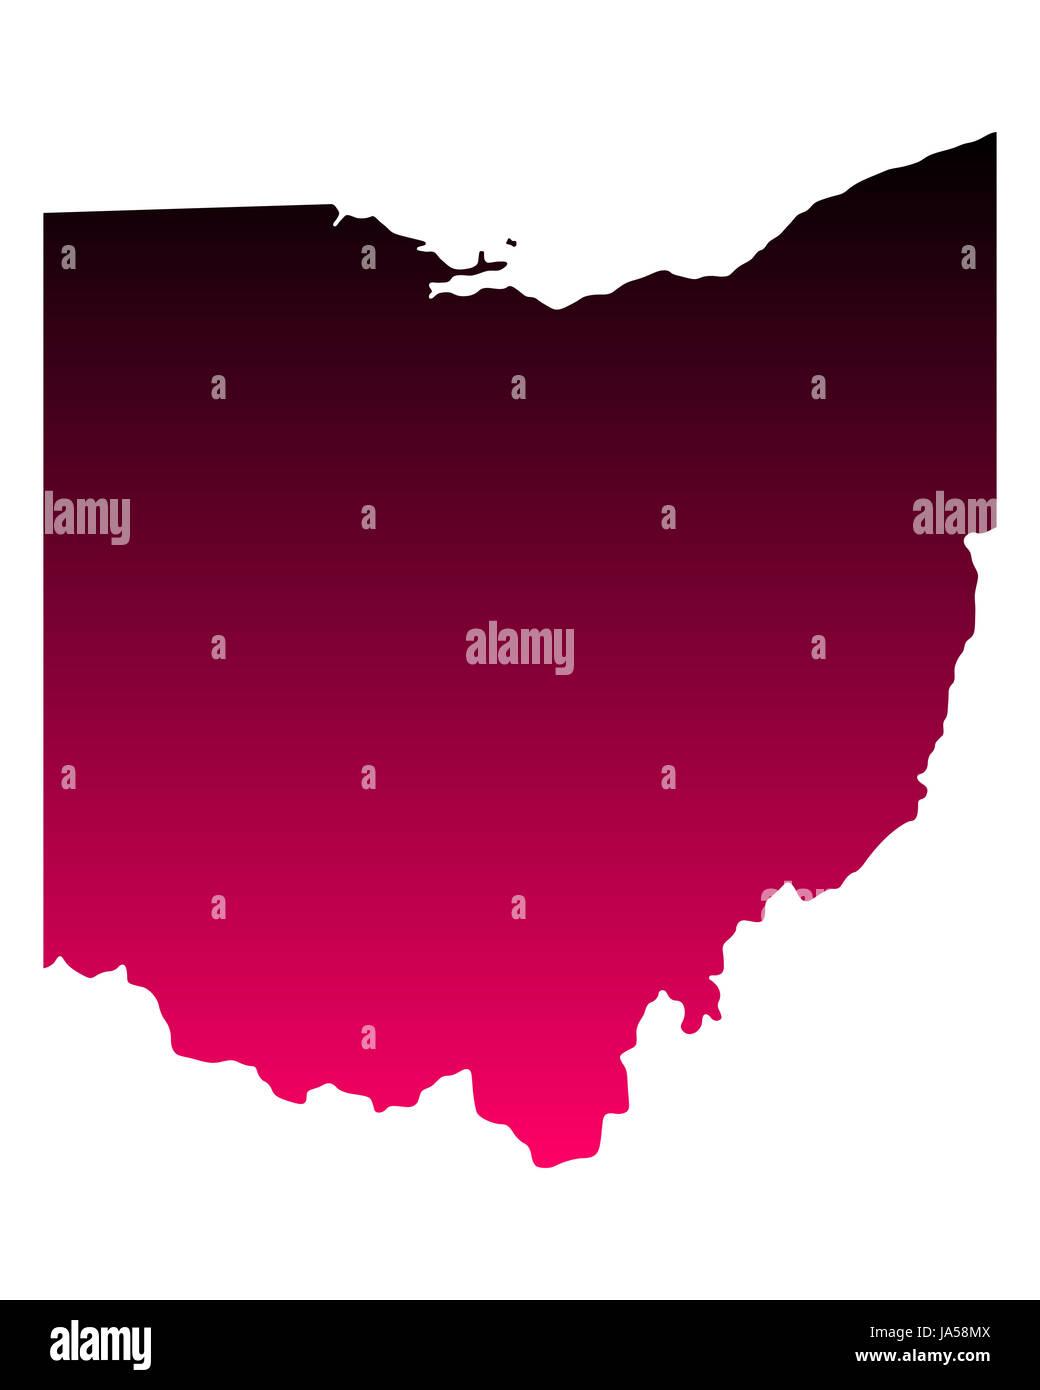 Karte von Ohio - Stock Image